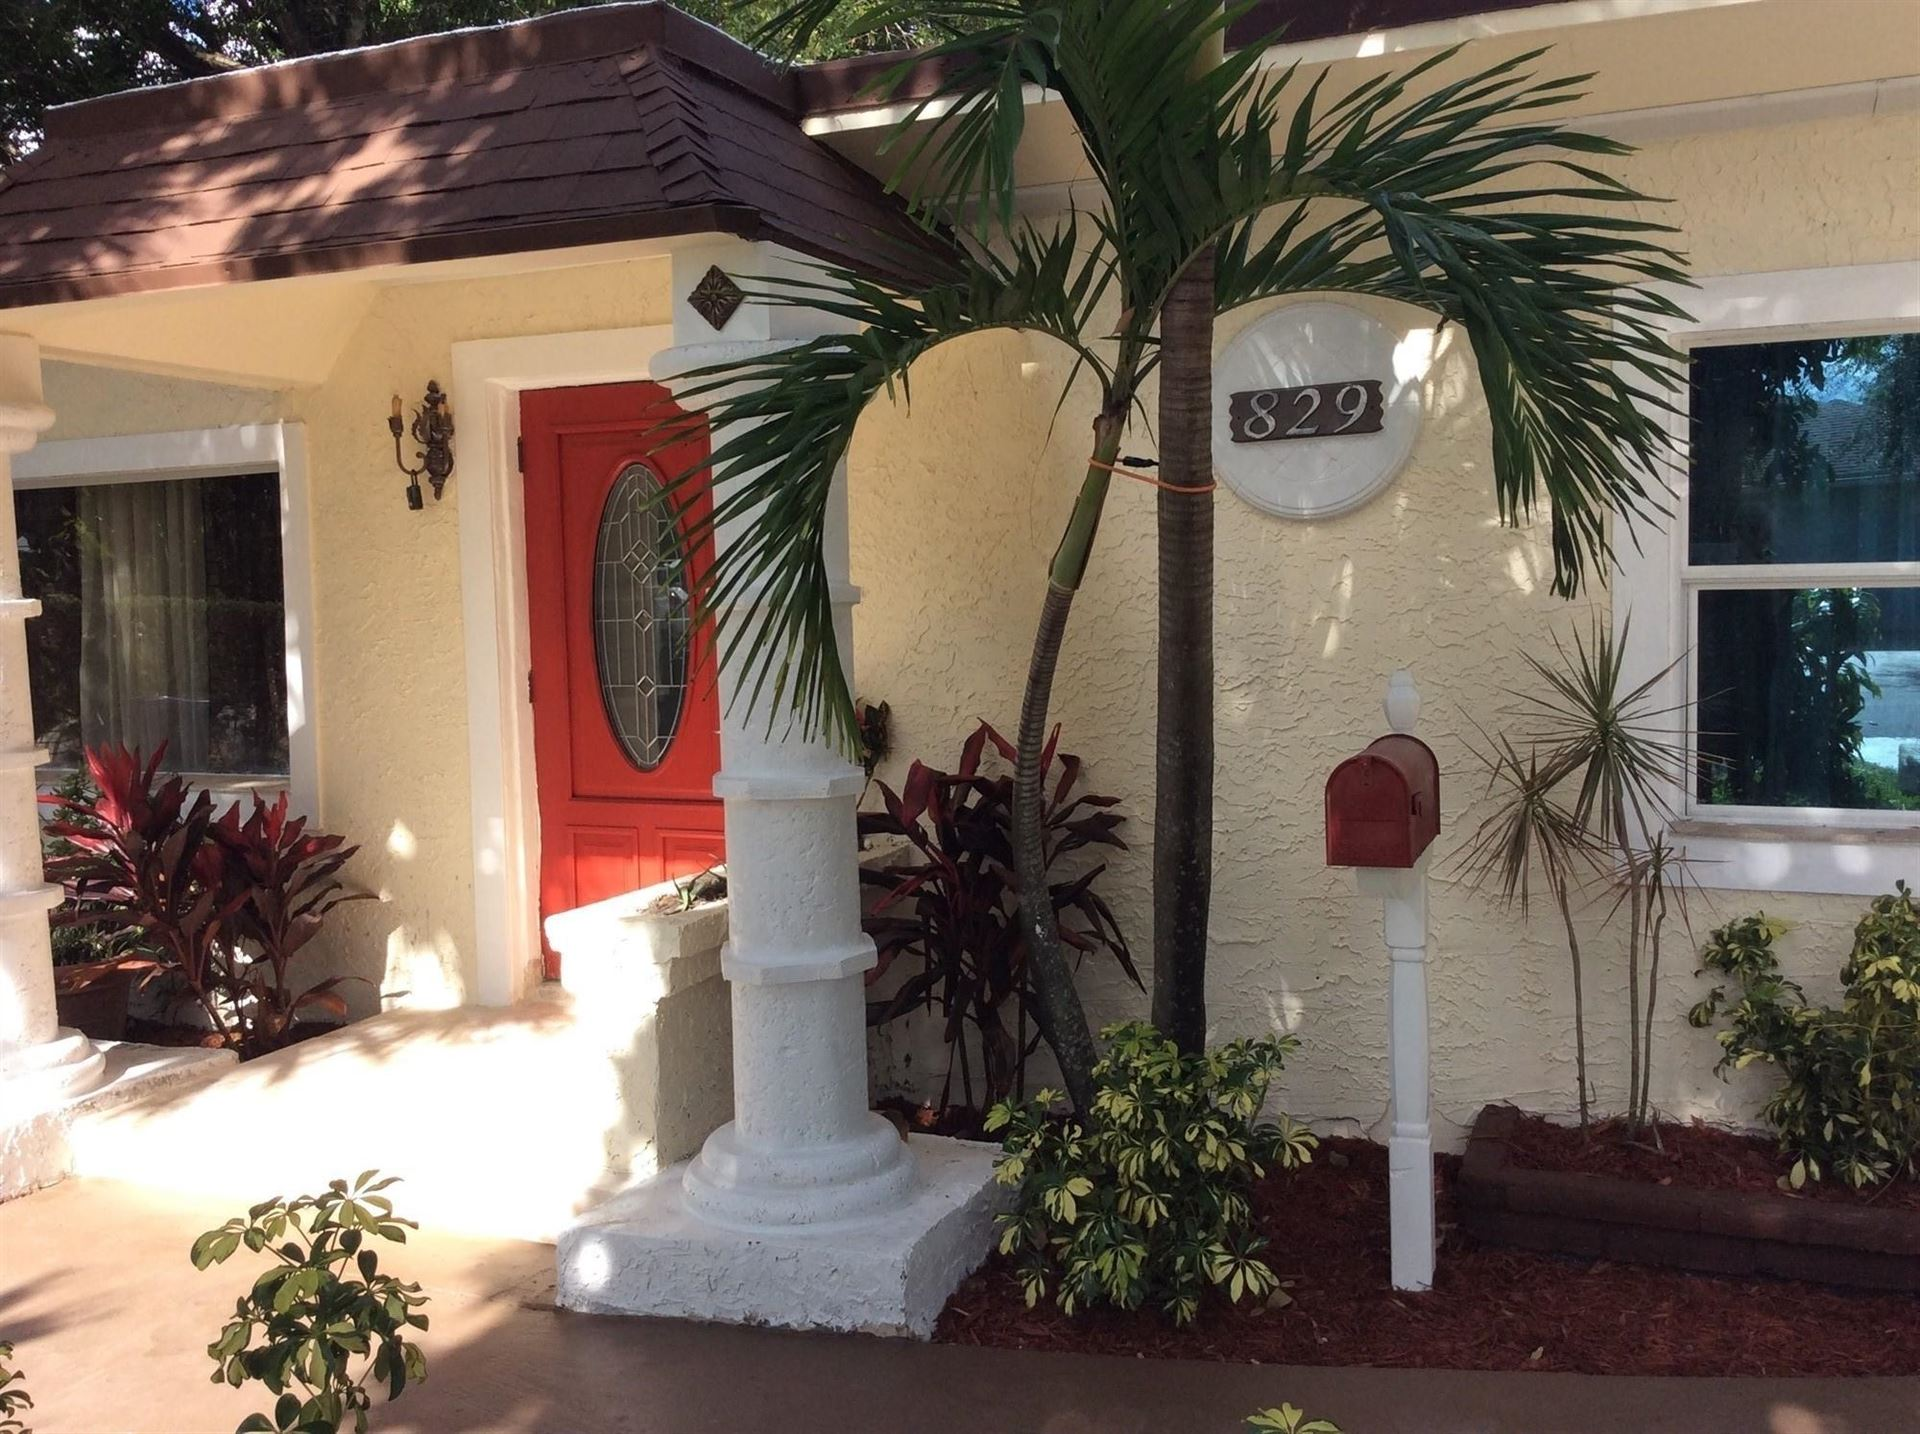 Photo of 829 NE 17th Street, Fort Lauderdale, FL 33305 (MLS # RX-10658244)